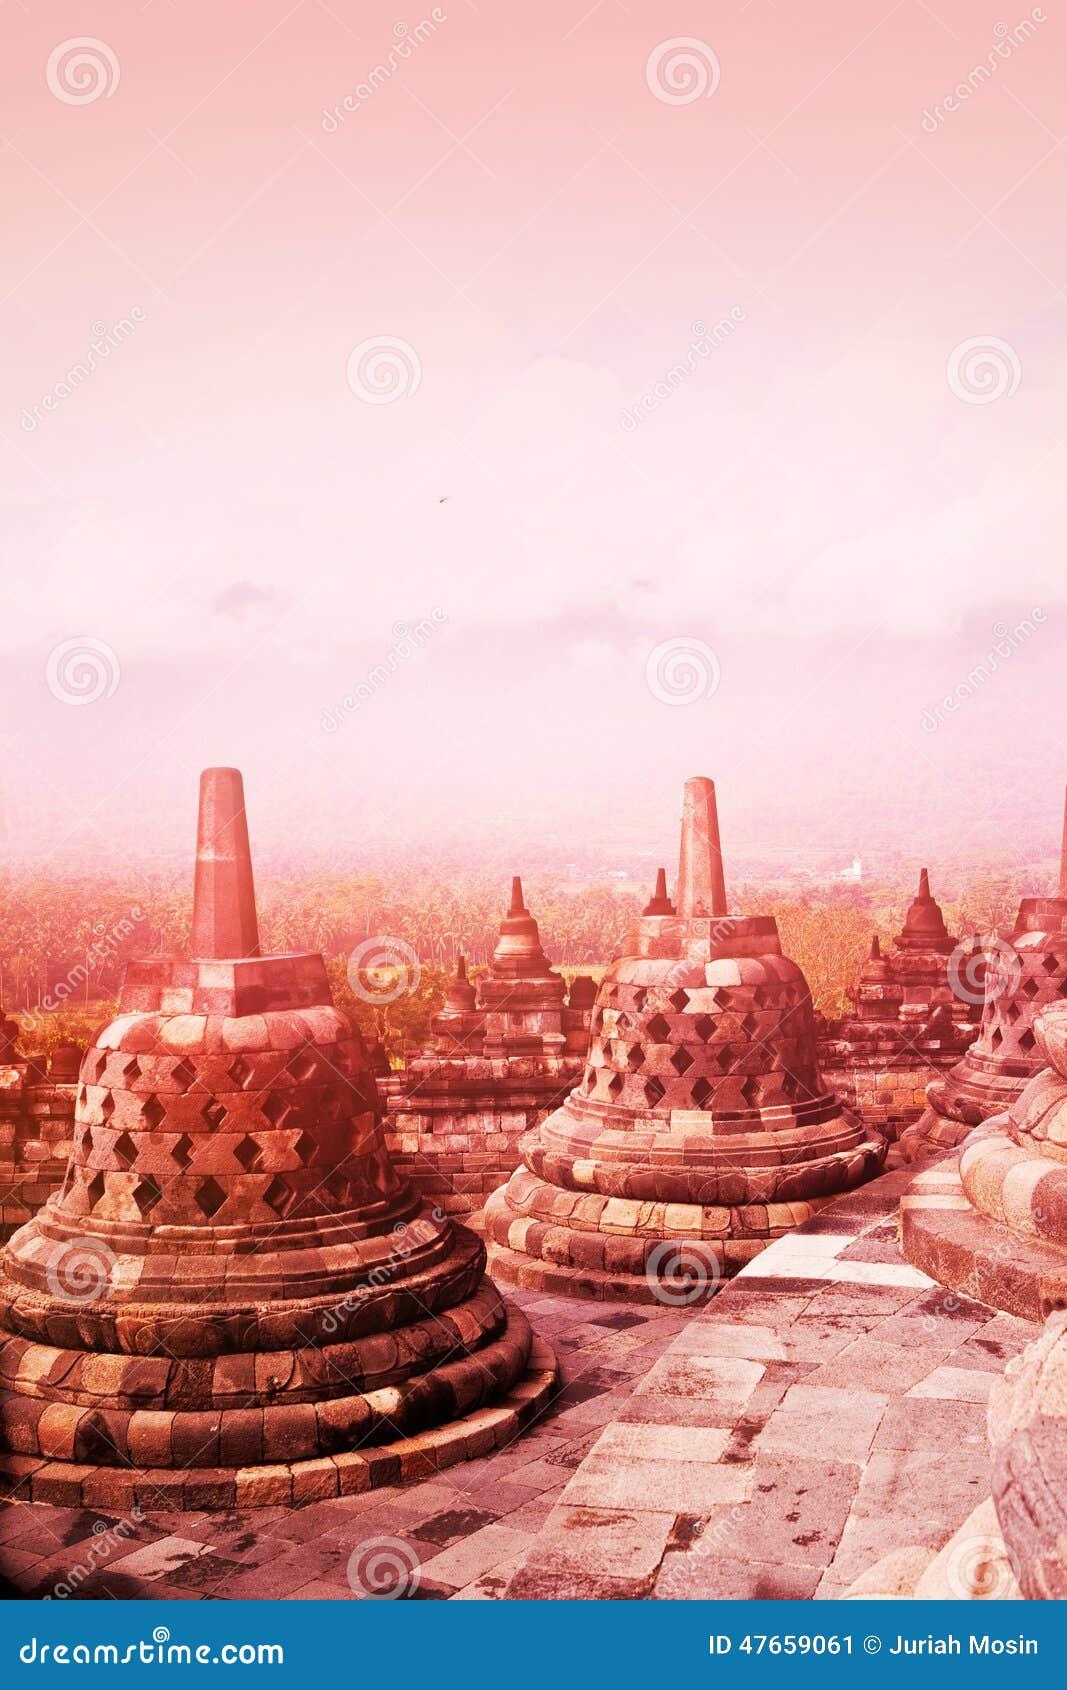 Monument antique de temple bouddhiste de Borobudur au lever de soleil, Yogyakarta, Java Indonesia